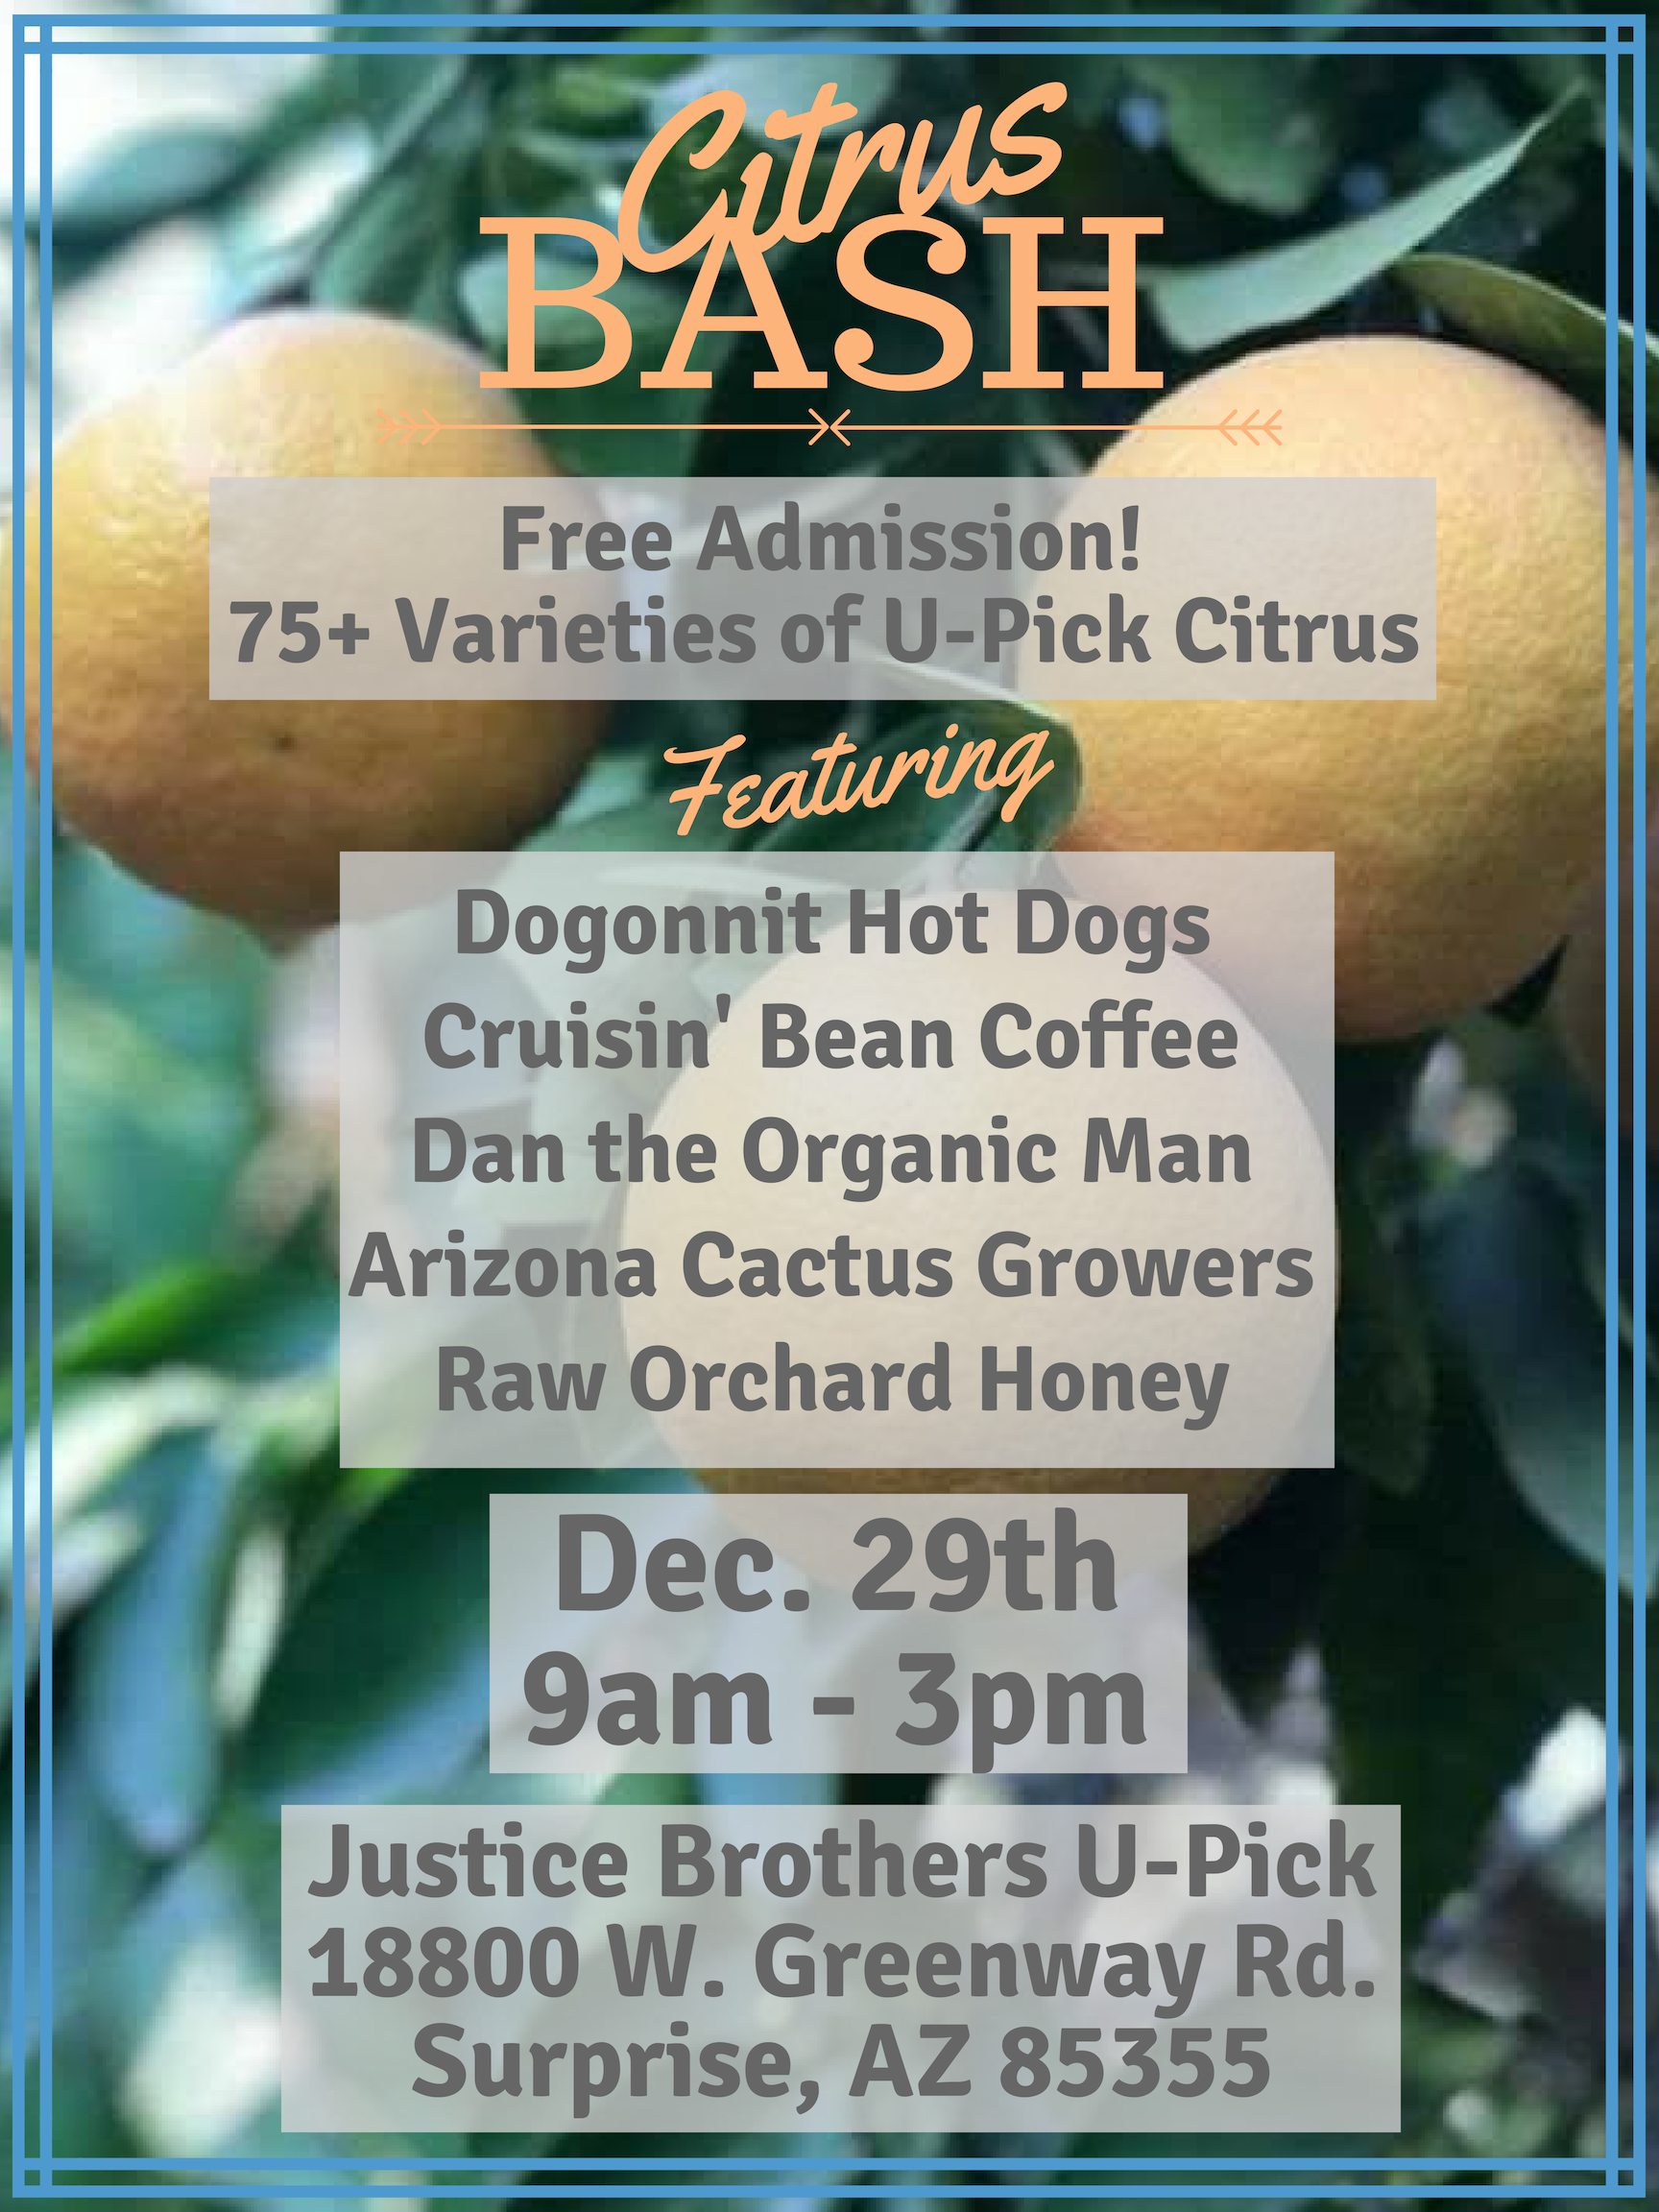 justice brothers upick December 2018 citrus bash poster.png